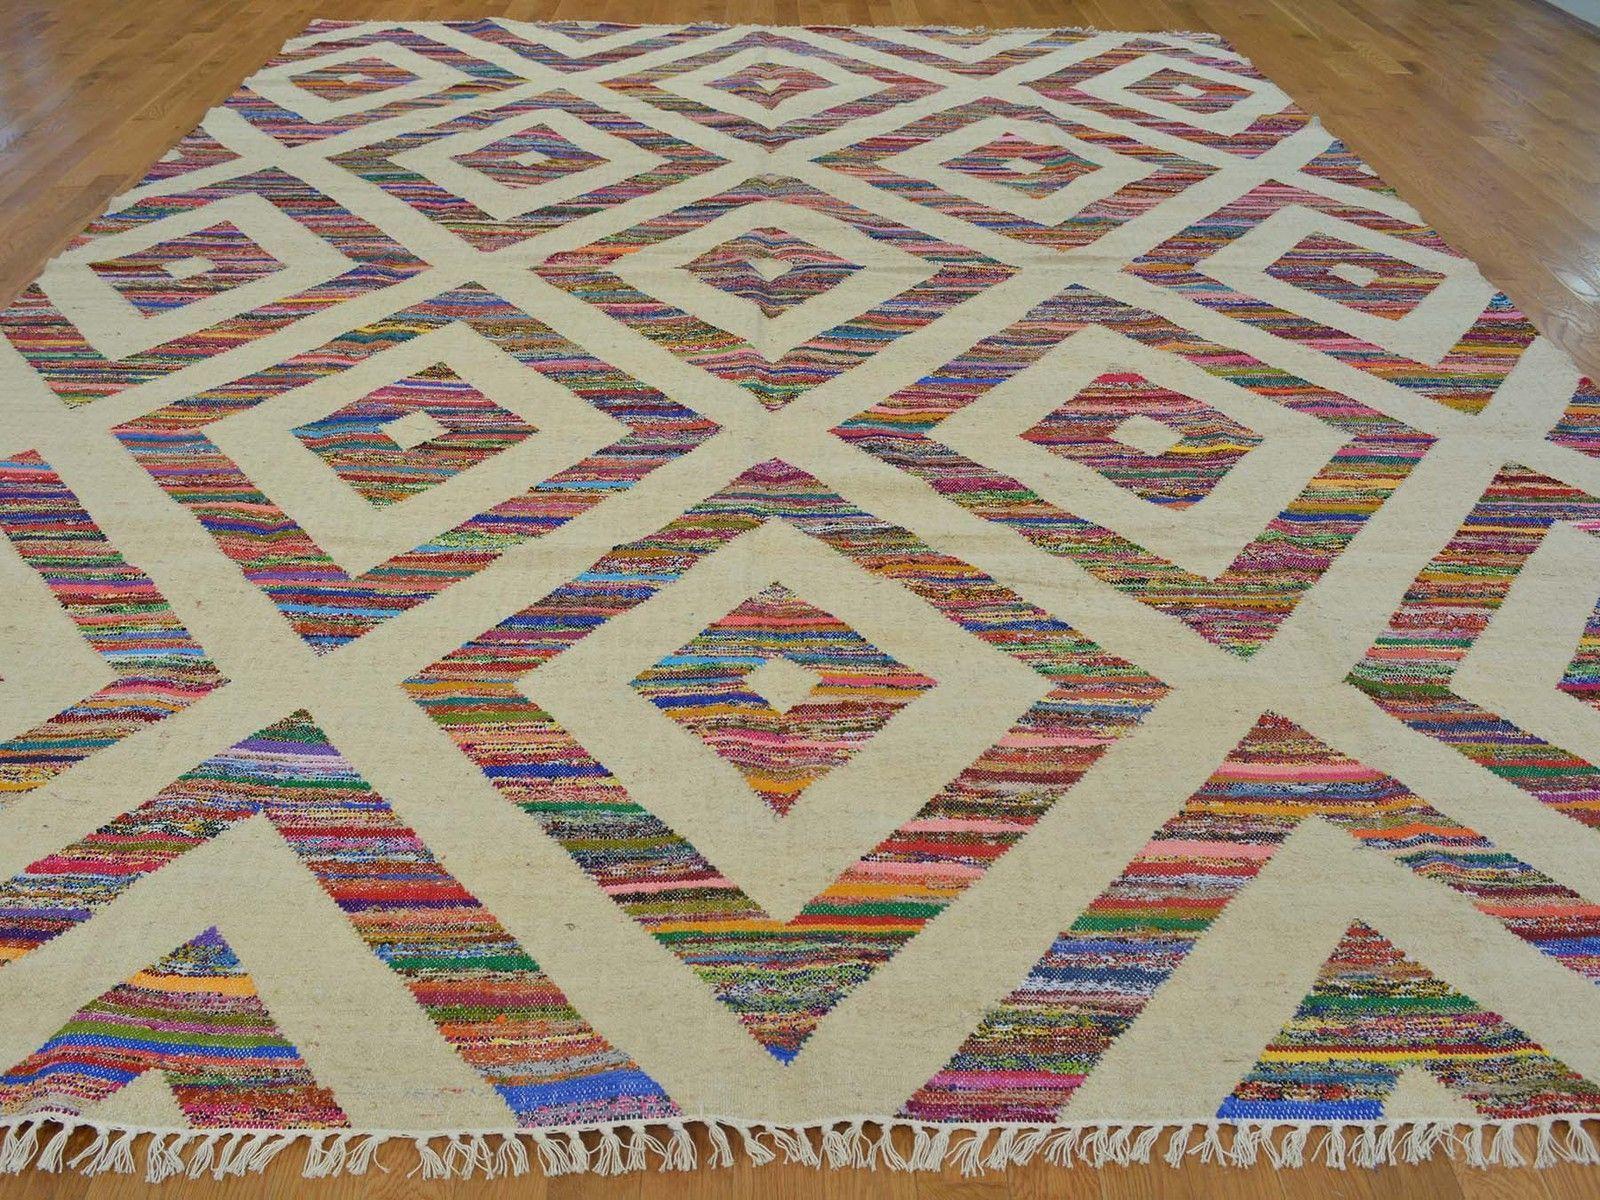 10'x14' Wool And Sari Silk Geometric Durie Kilim Oriental Rug Hand Woven G21532